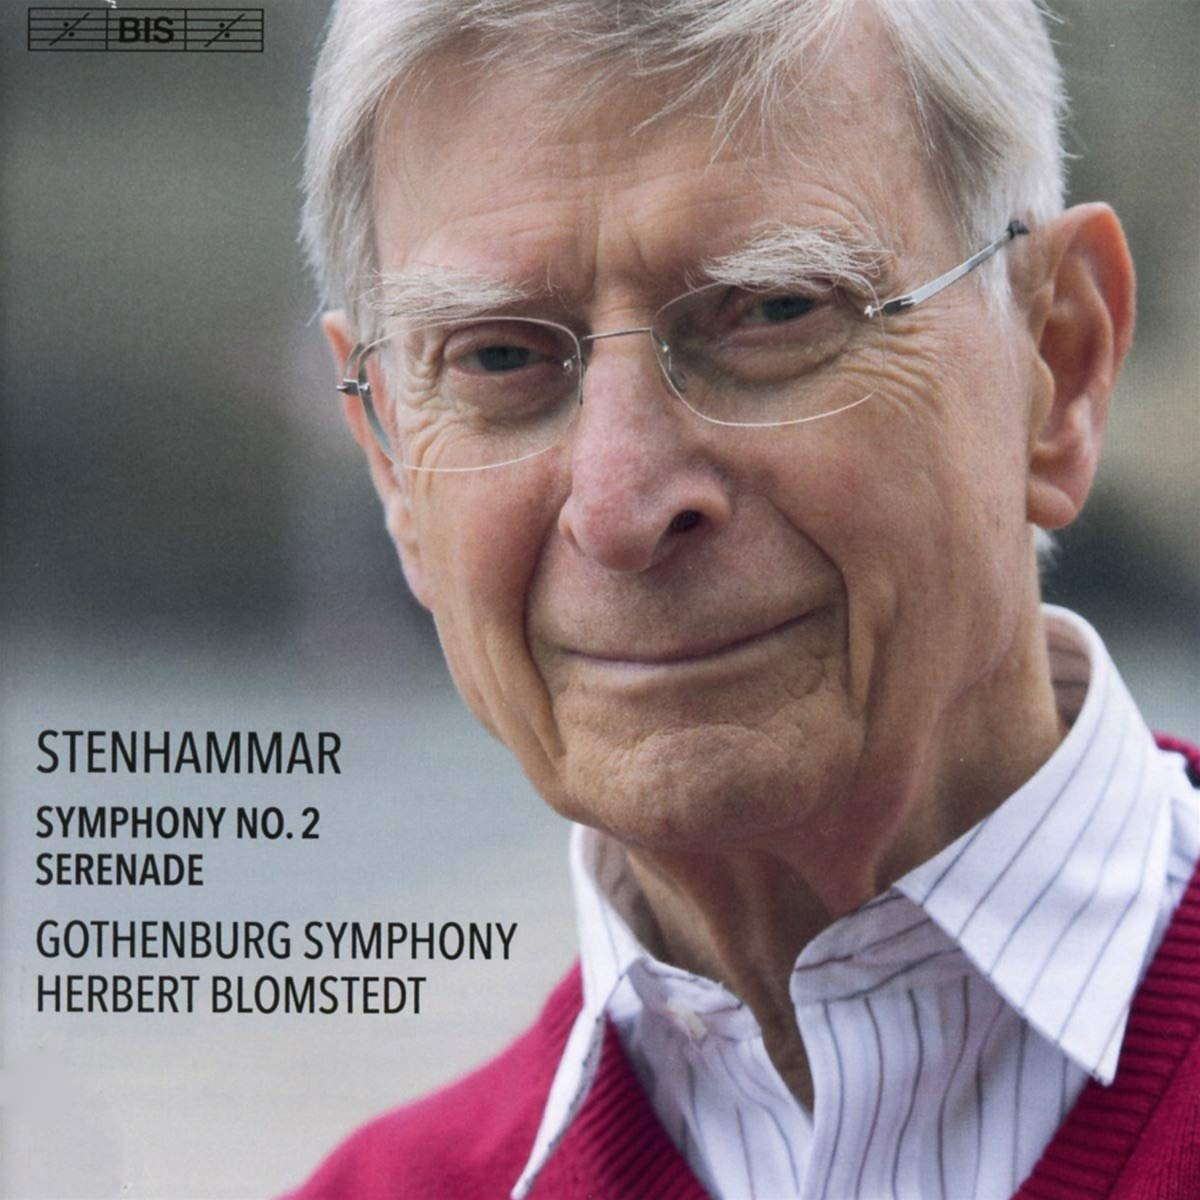 SACD : GOTHENBURG SYMPHONY - Symphony 2 /  Serenade (Hybrid SACD)